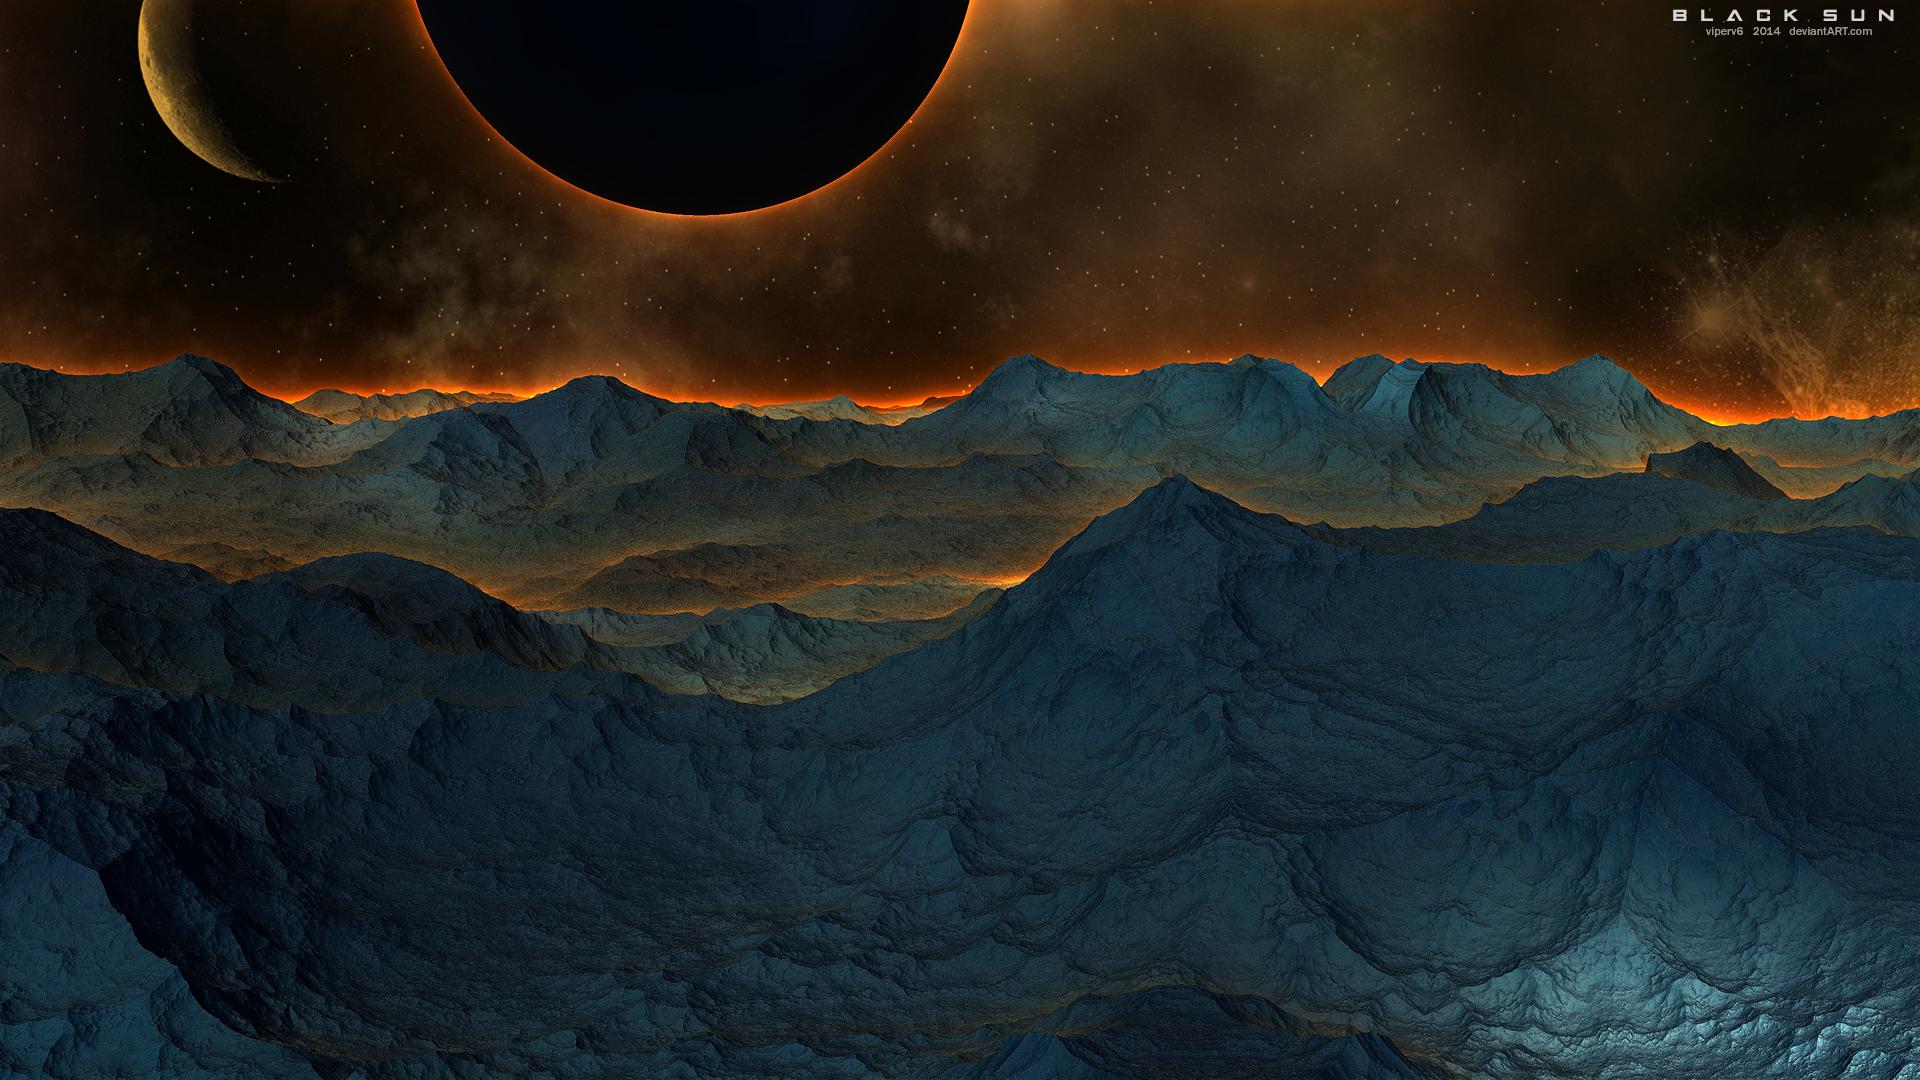 Black Sun by viperv6